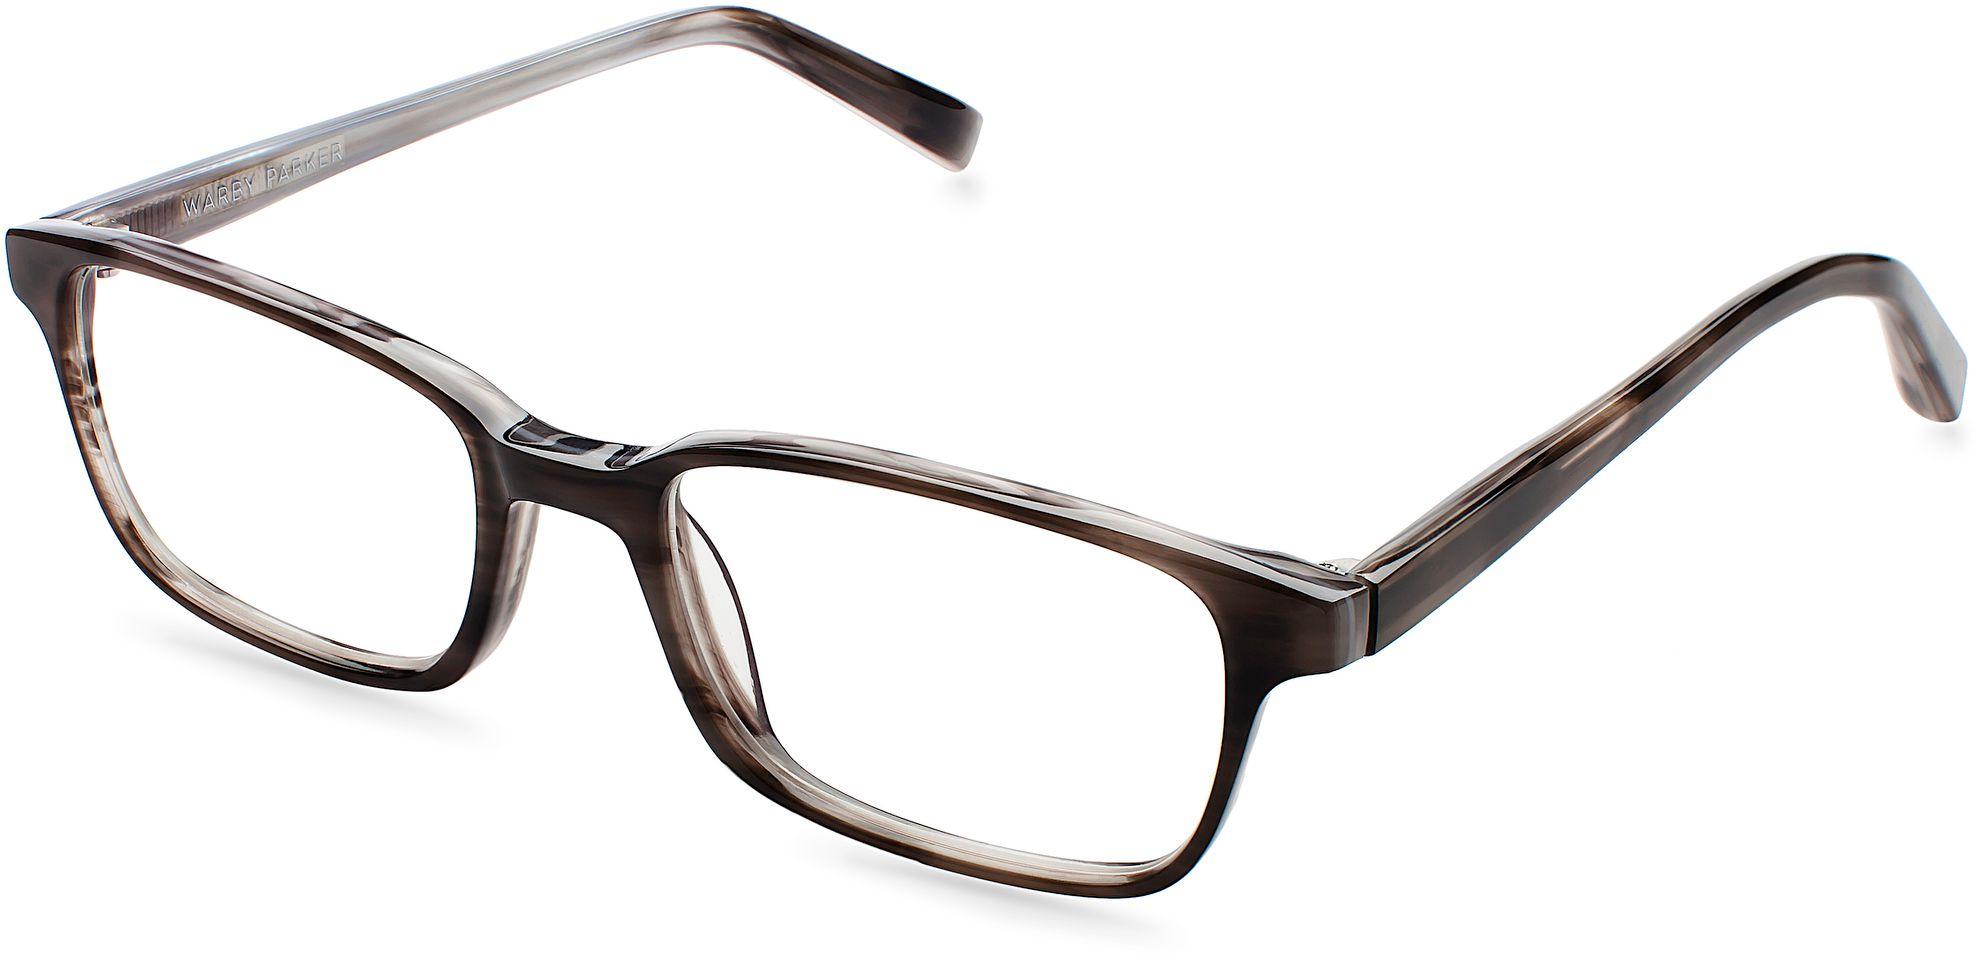 673f8c3fca Wilkie Eyeglasses in Greystone for Women